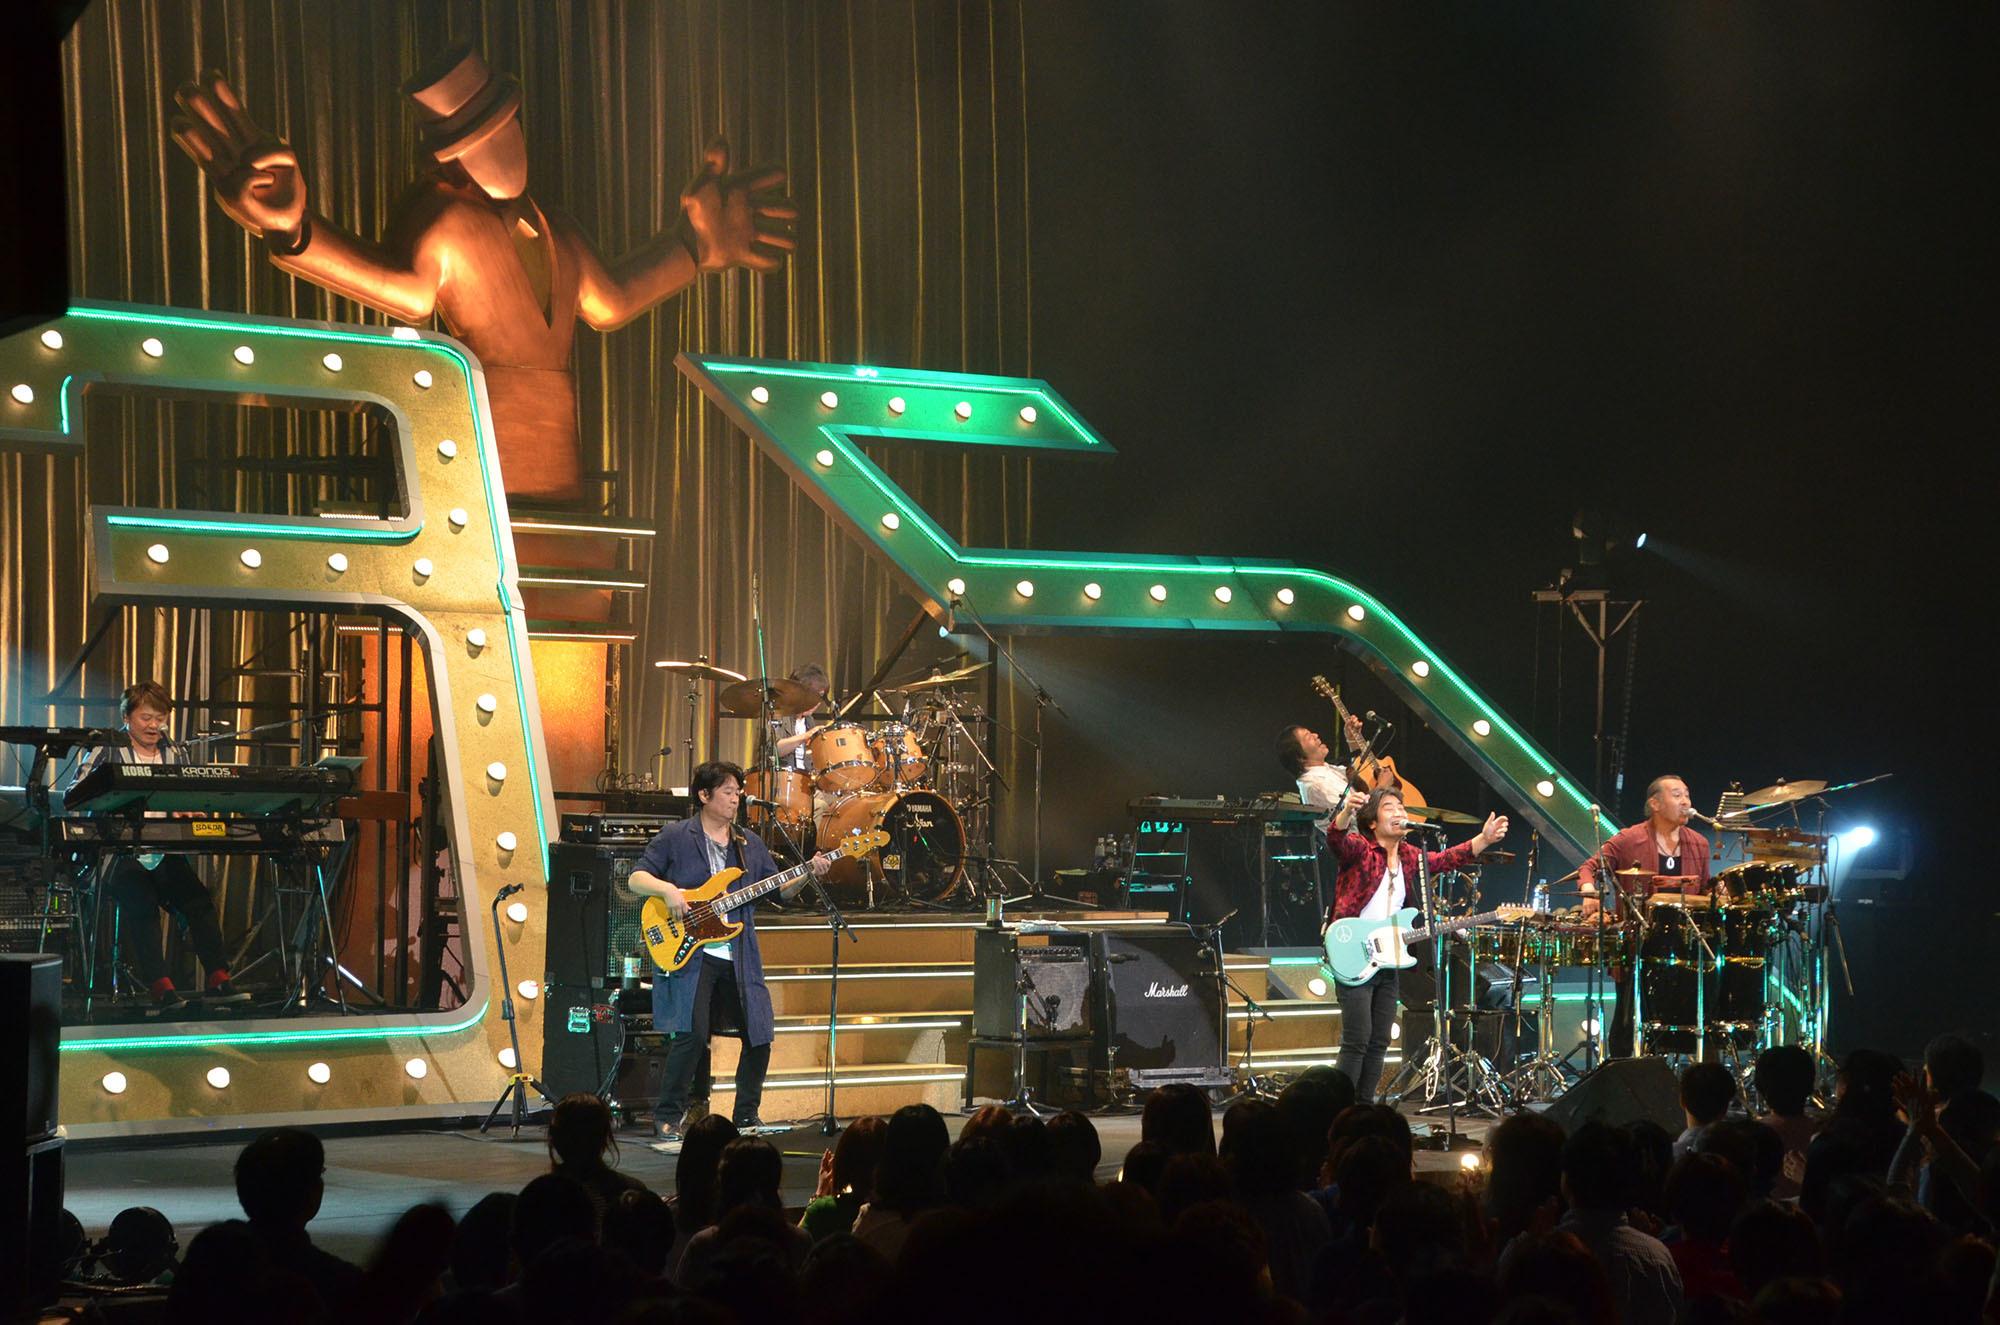 『STARDUST REVUE 35th Anniversary Tour「スタ☆レビ」』ファイナル公演